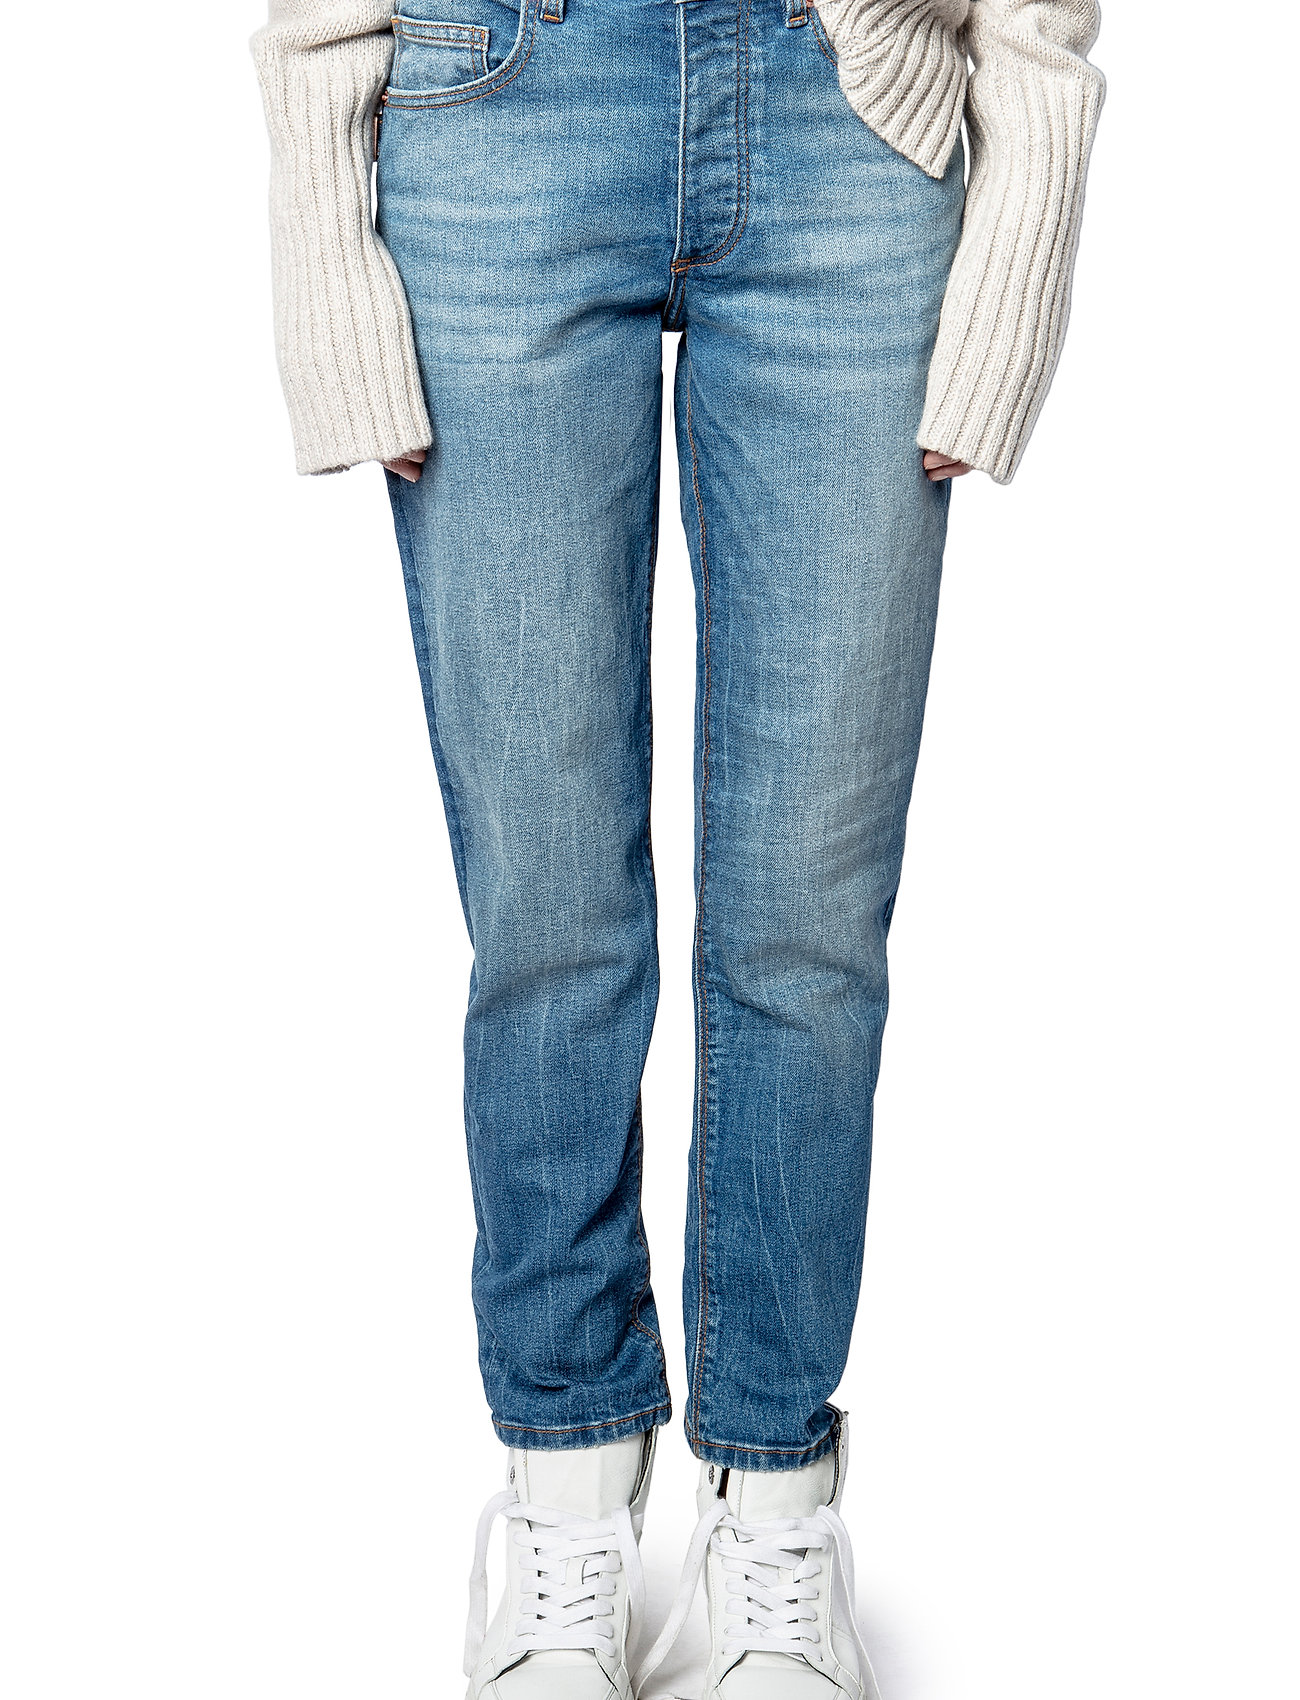 Zadig & Voltaire - MAMMA DENIM ECO LIGHT DENIM - straight jeans - light blue - 0